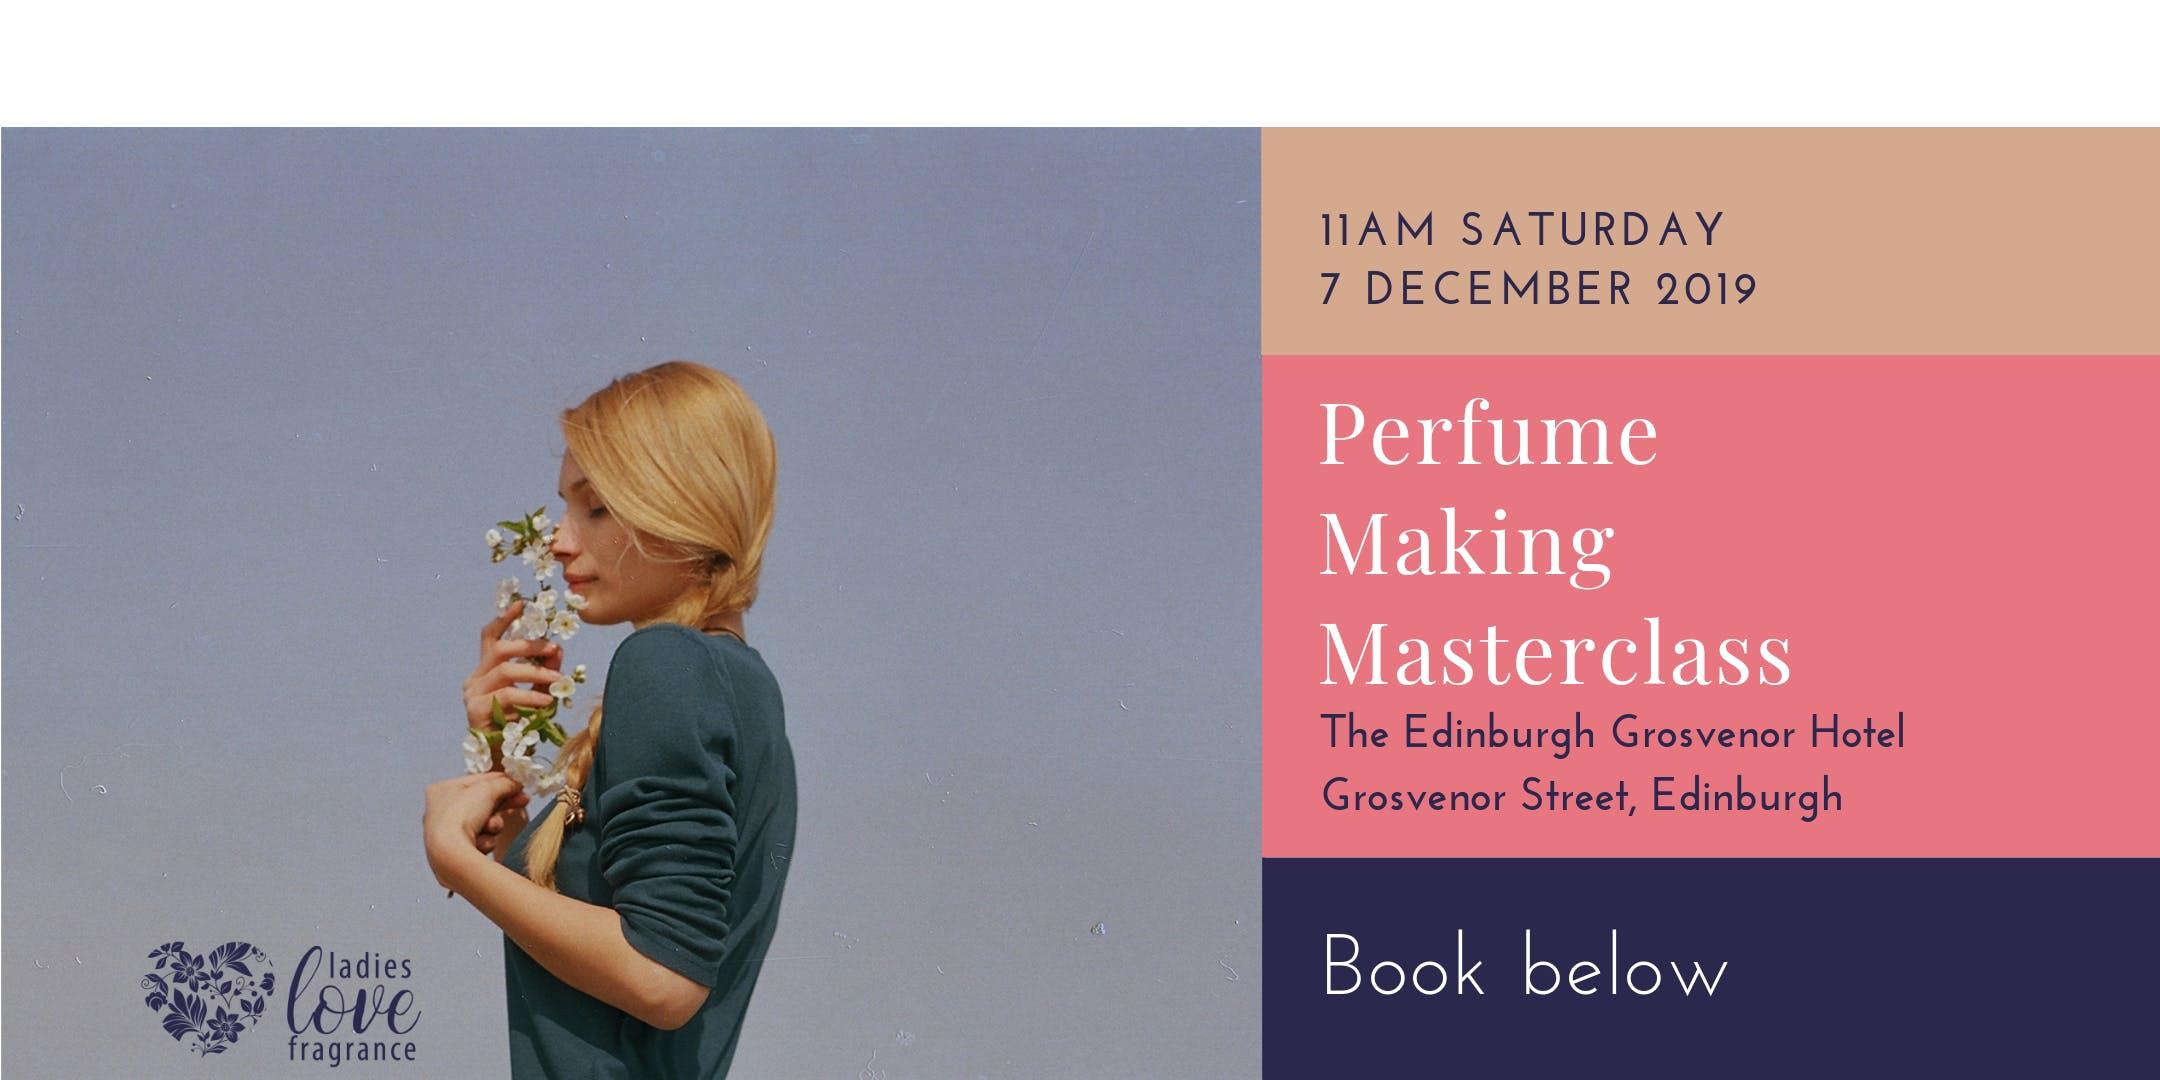 Perfume Making Masterclass - Edinburgh Saturday 7 December at 11am